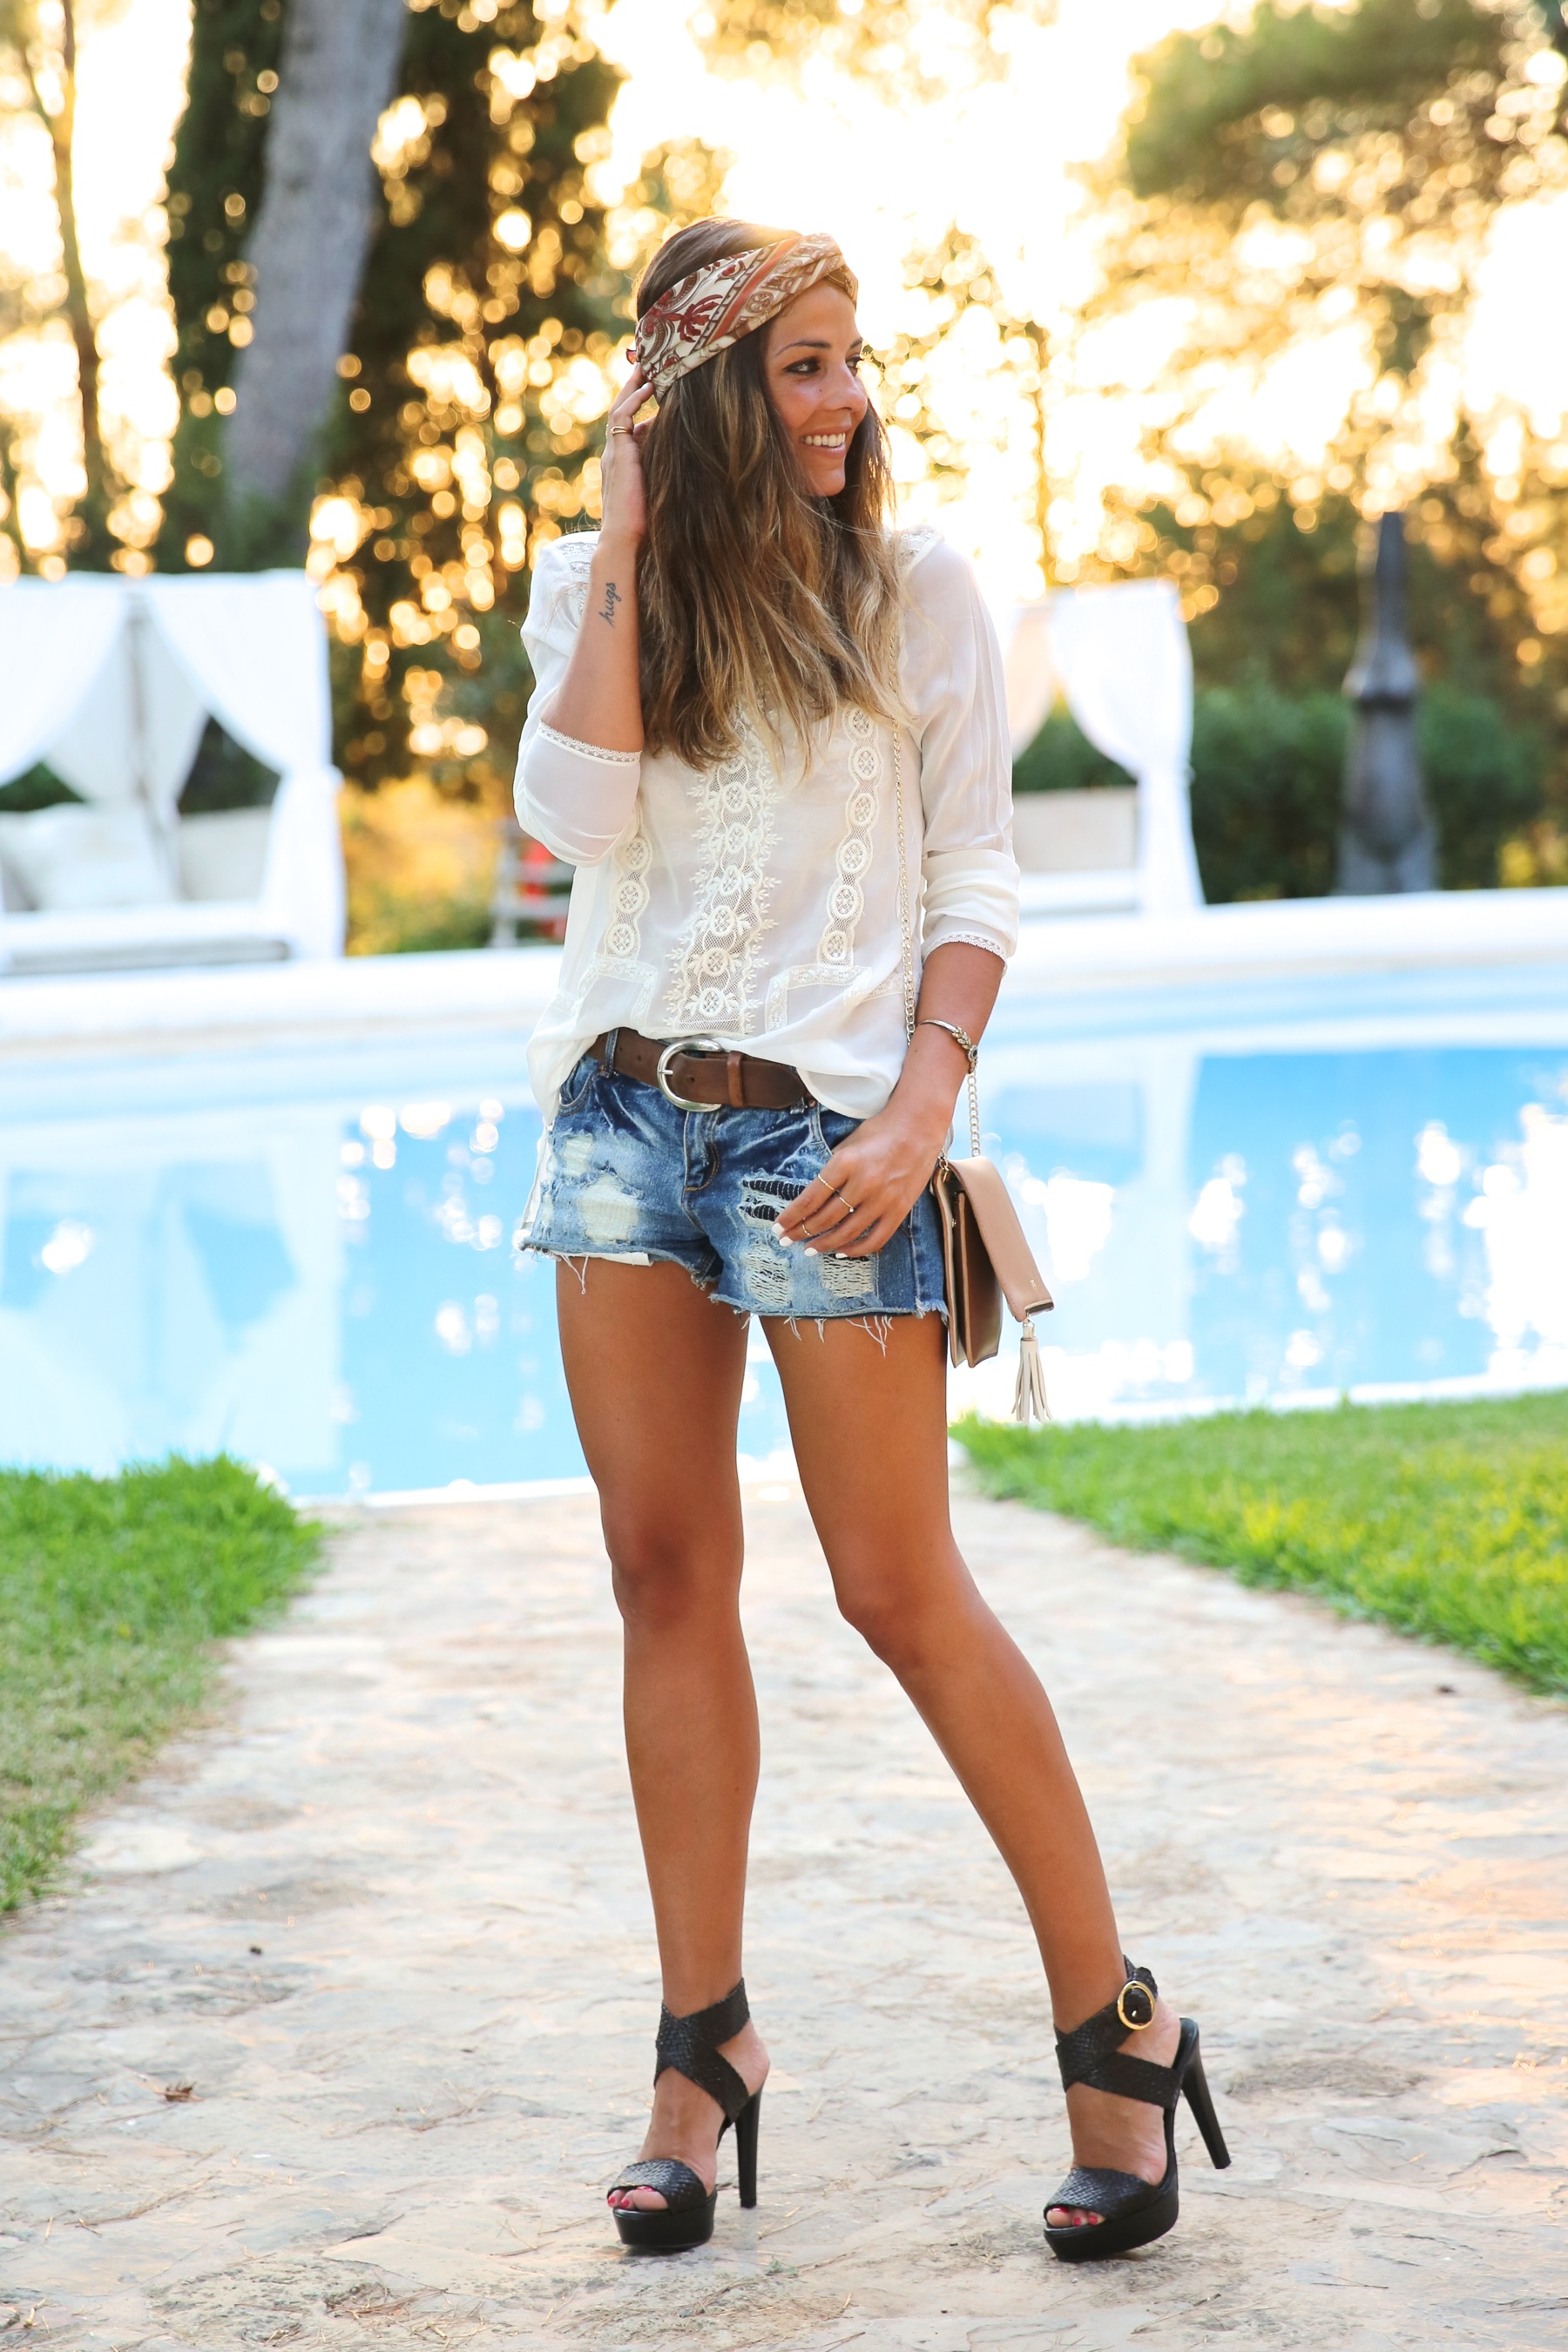 trendy_taste-look-outfit-street_style-ootd-blog-blogger-fashion_spain-moda_españa-boho-hippie-denim_shorts-shorts_vaqueros-blusa-blouse-mas34-pg-ibiza-sa_talaia-11